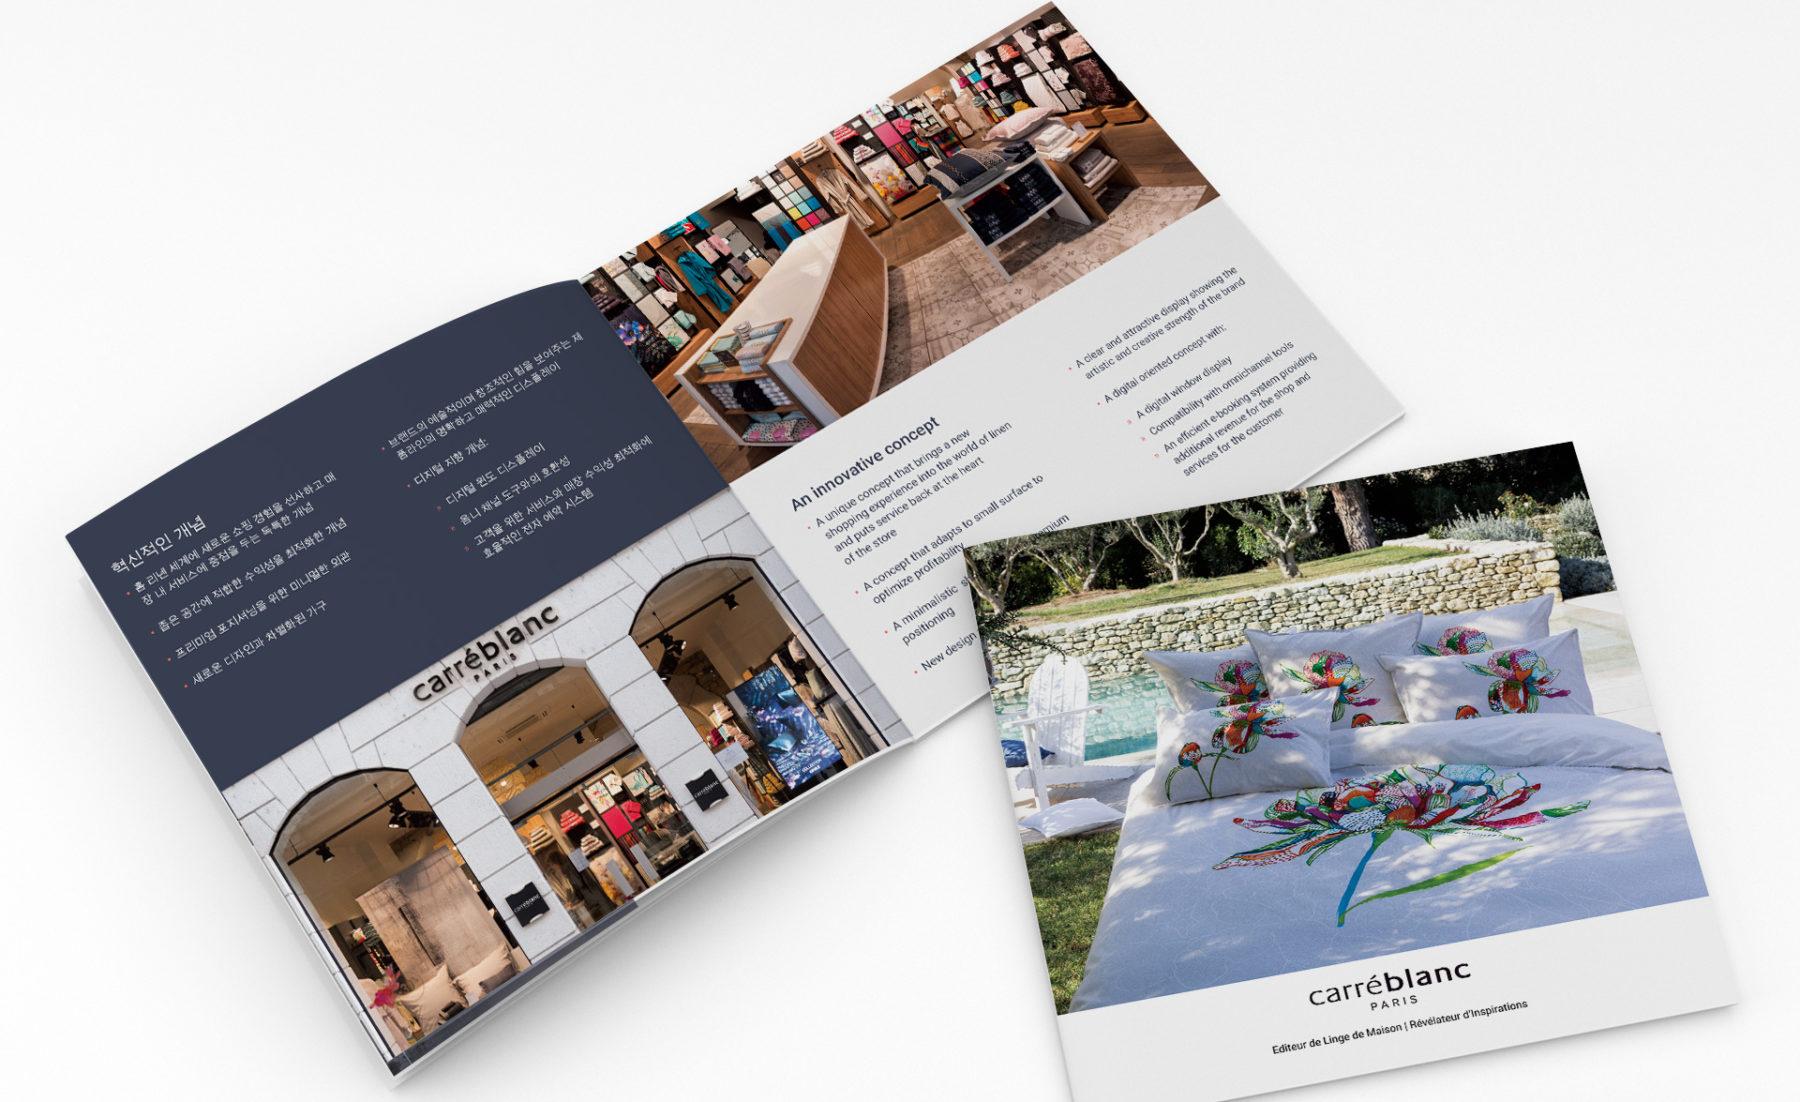 Carré blanc's brochure designed by MADMINT